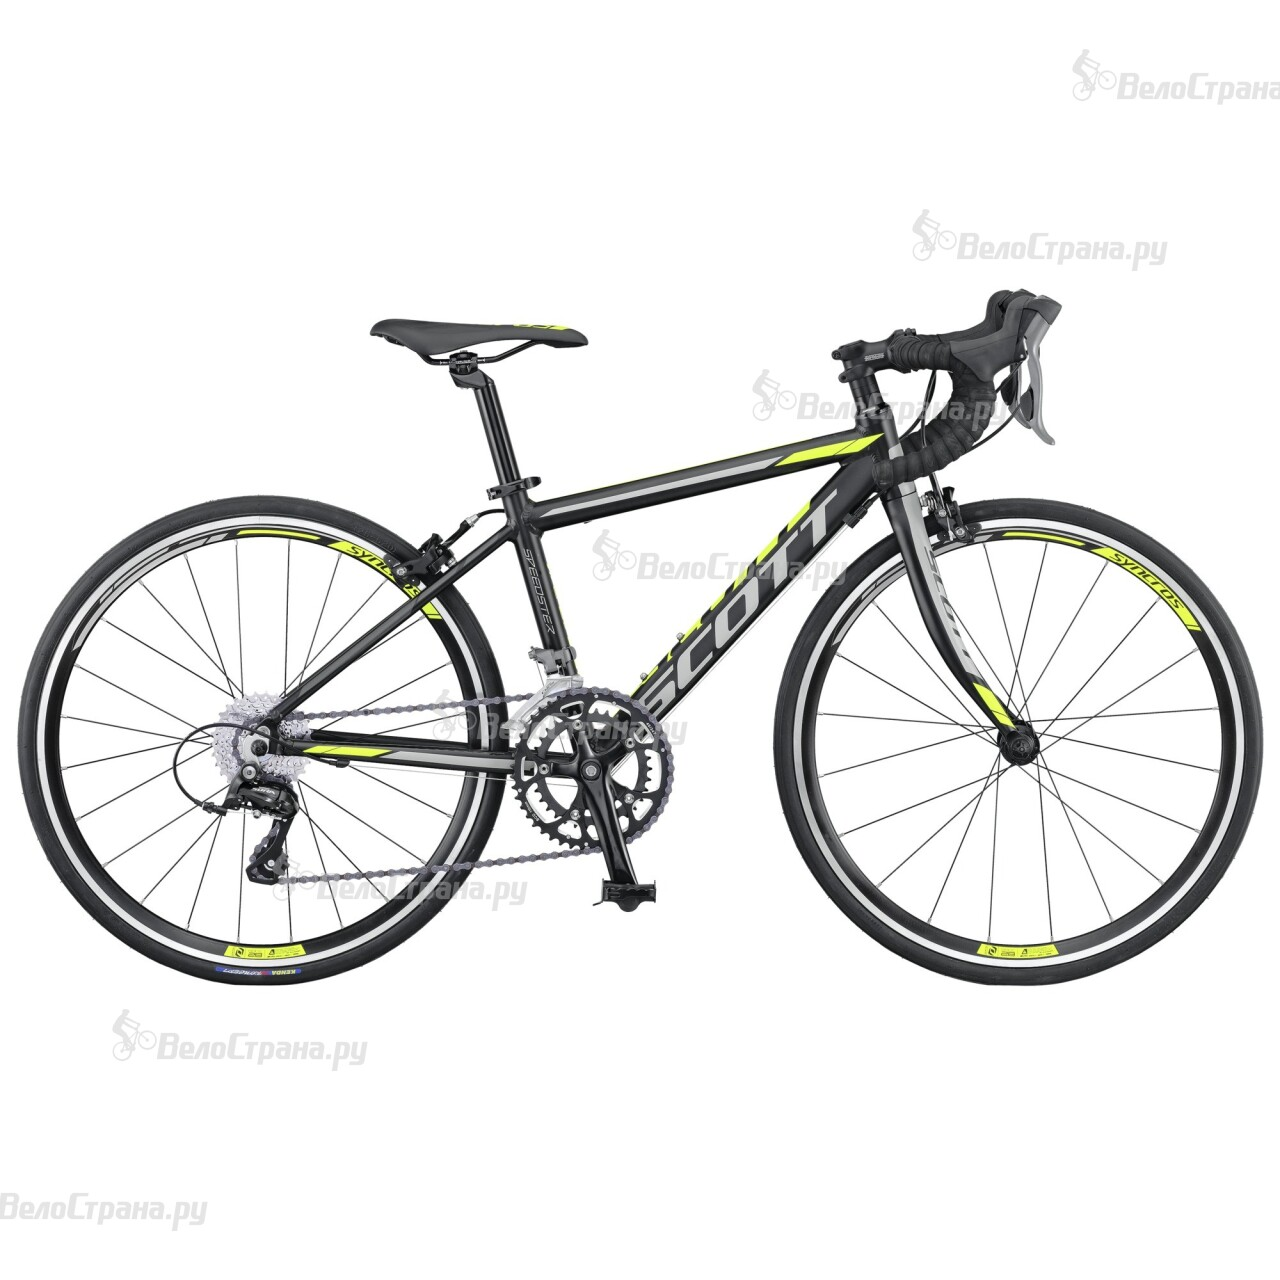 Велосипед Scott Speedster JR 24 (2016) велосипед scott voltage jr 24 24 2016